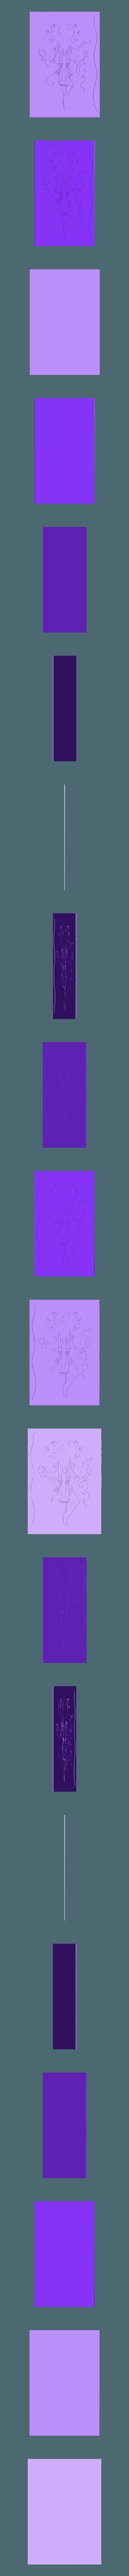 Mythologic_No1_v1.stl Télécharger fichier STL gratuit Mythologique • Design à imprimer en 3D, yb__magiic